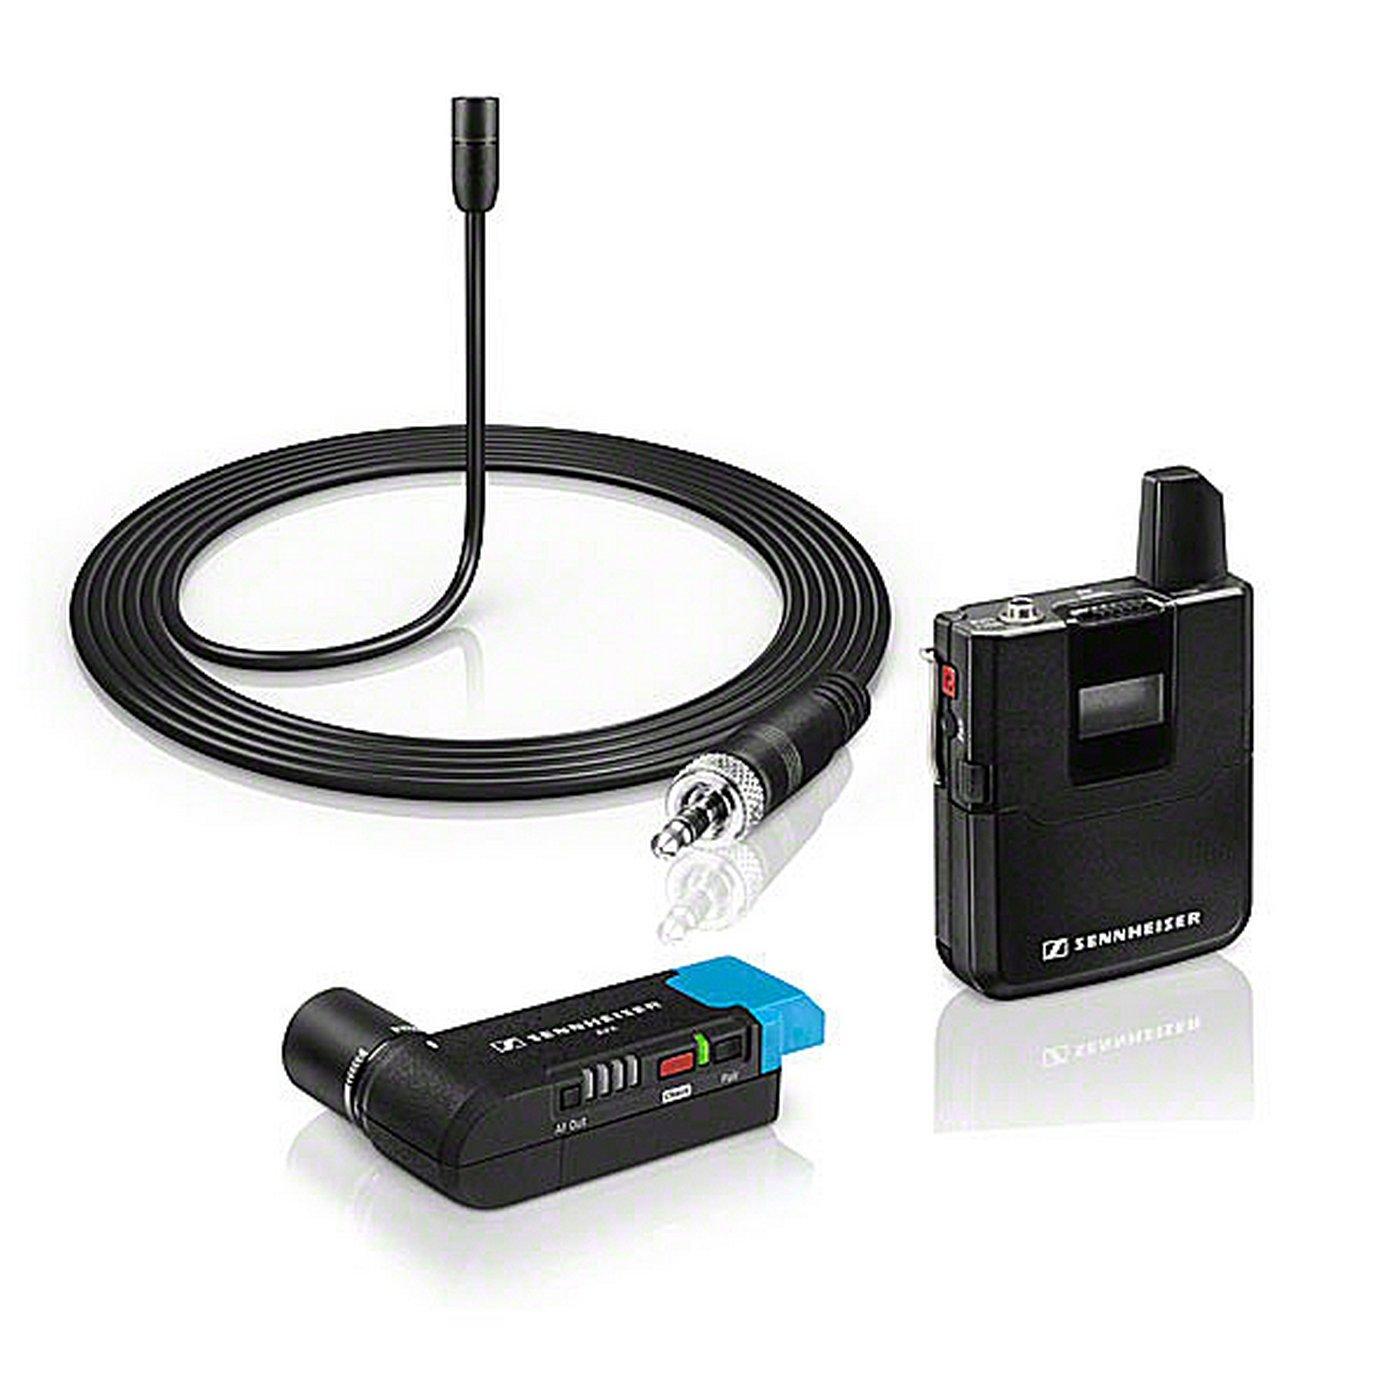 Sennheiser AVX-ME2 SET-4-US | Camera Mountable ME2 Lavalier Digital Wireless Set